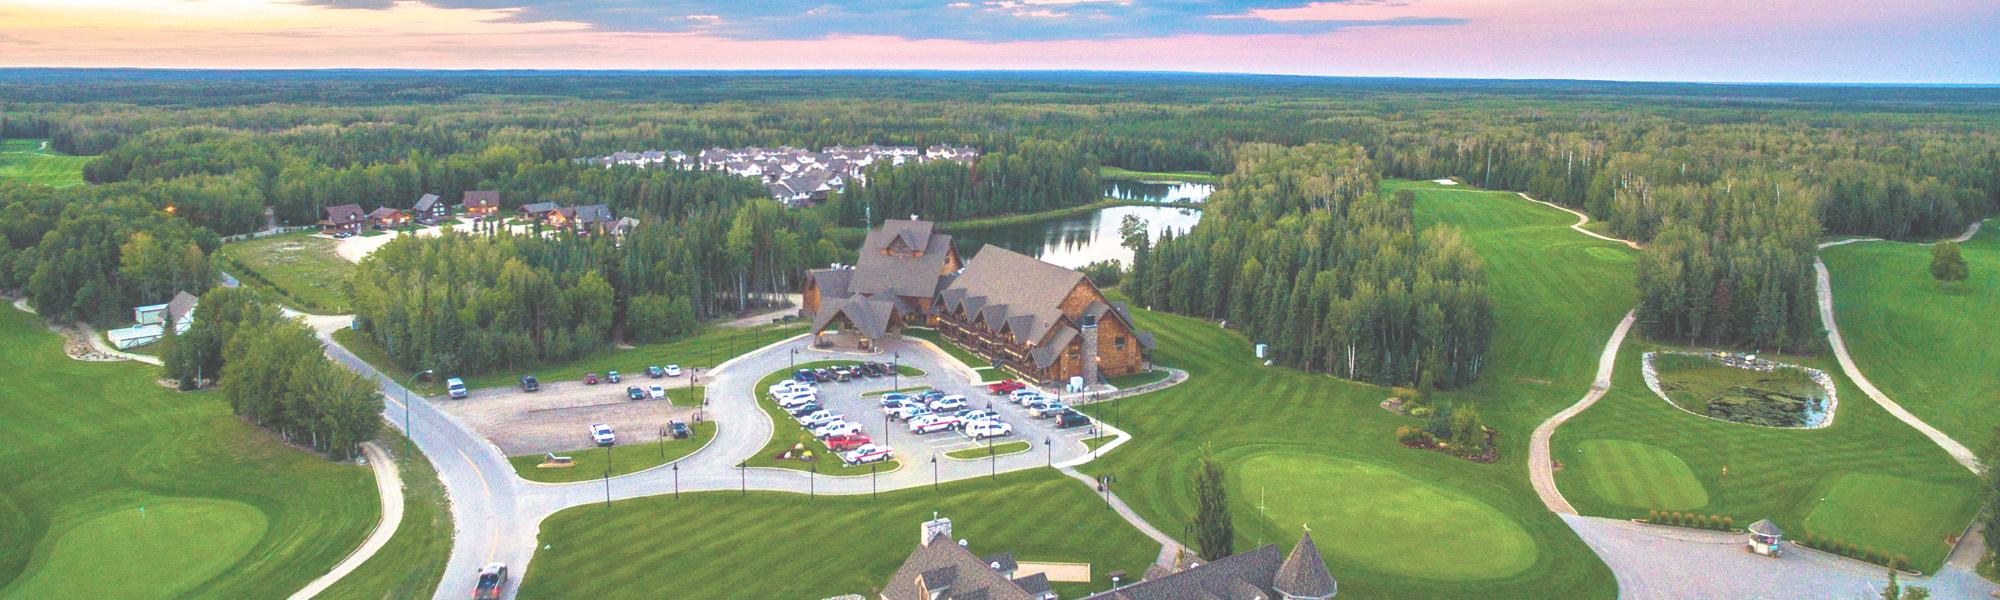 Located at Saskatchewan's highest rated resort